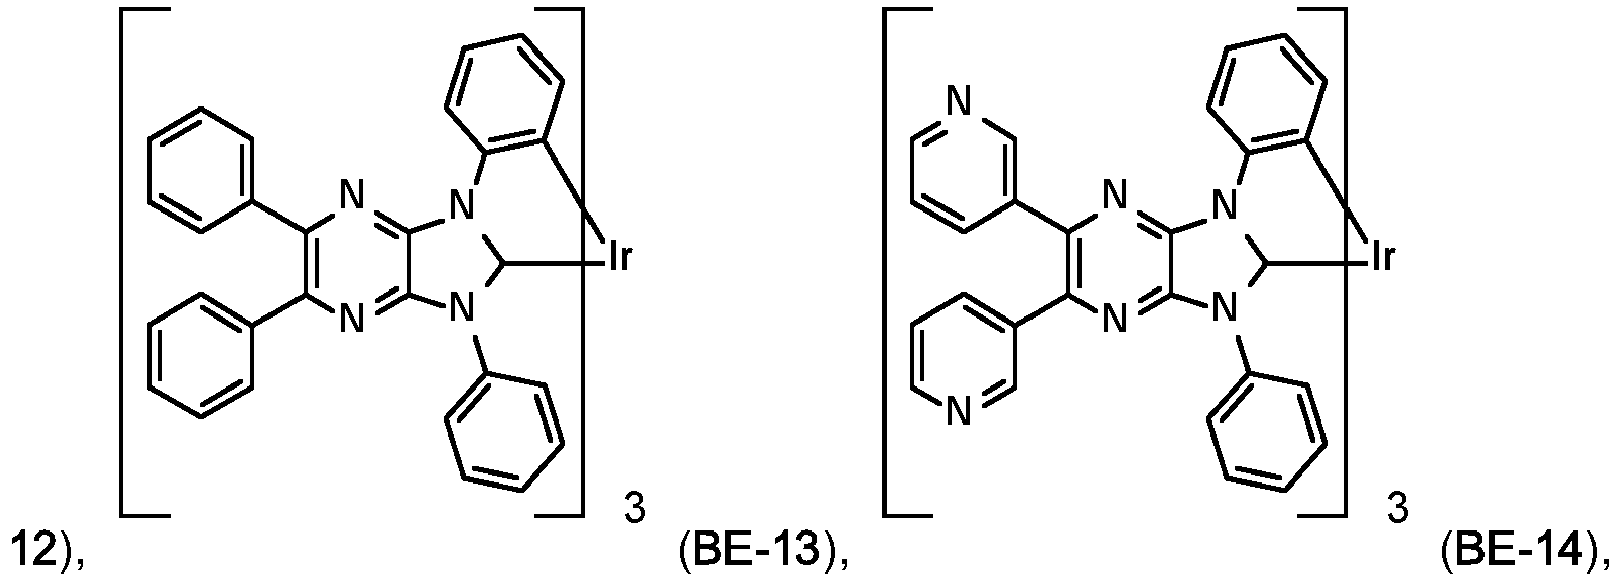 Figure imgb0756